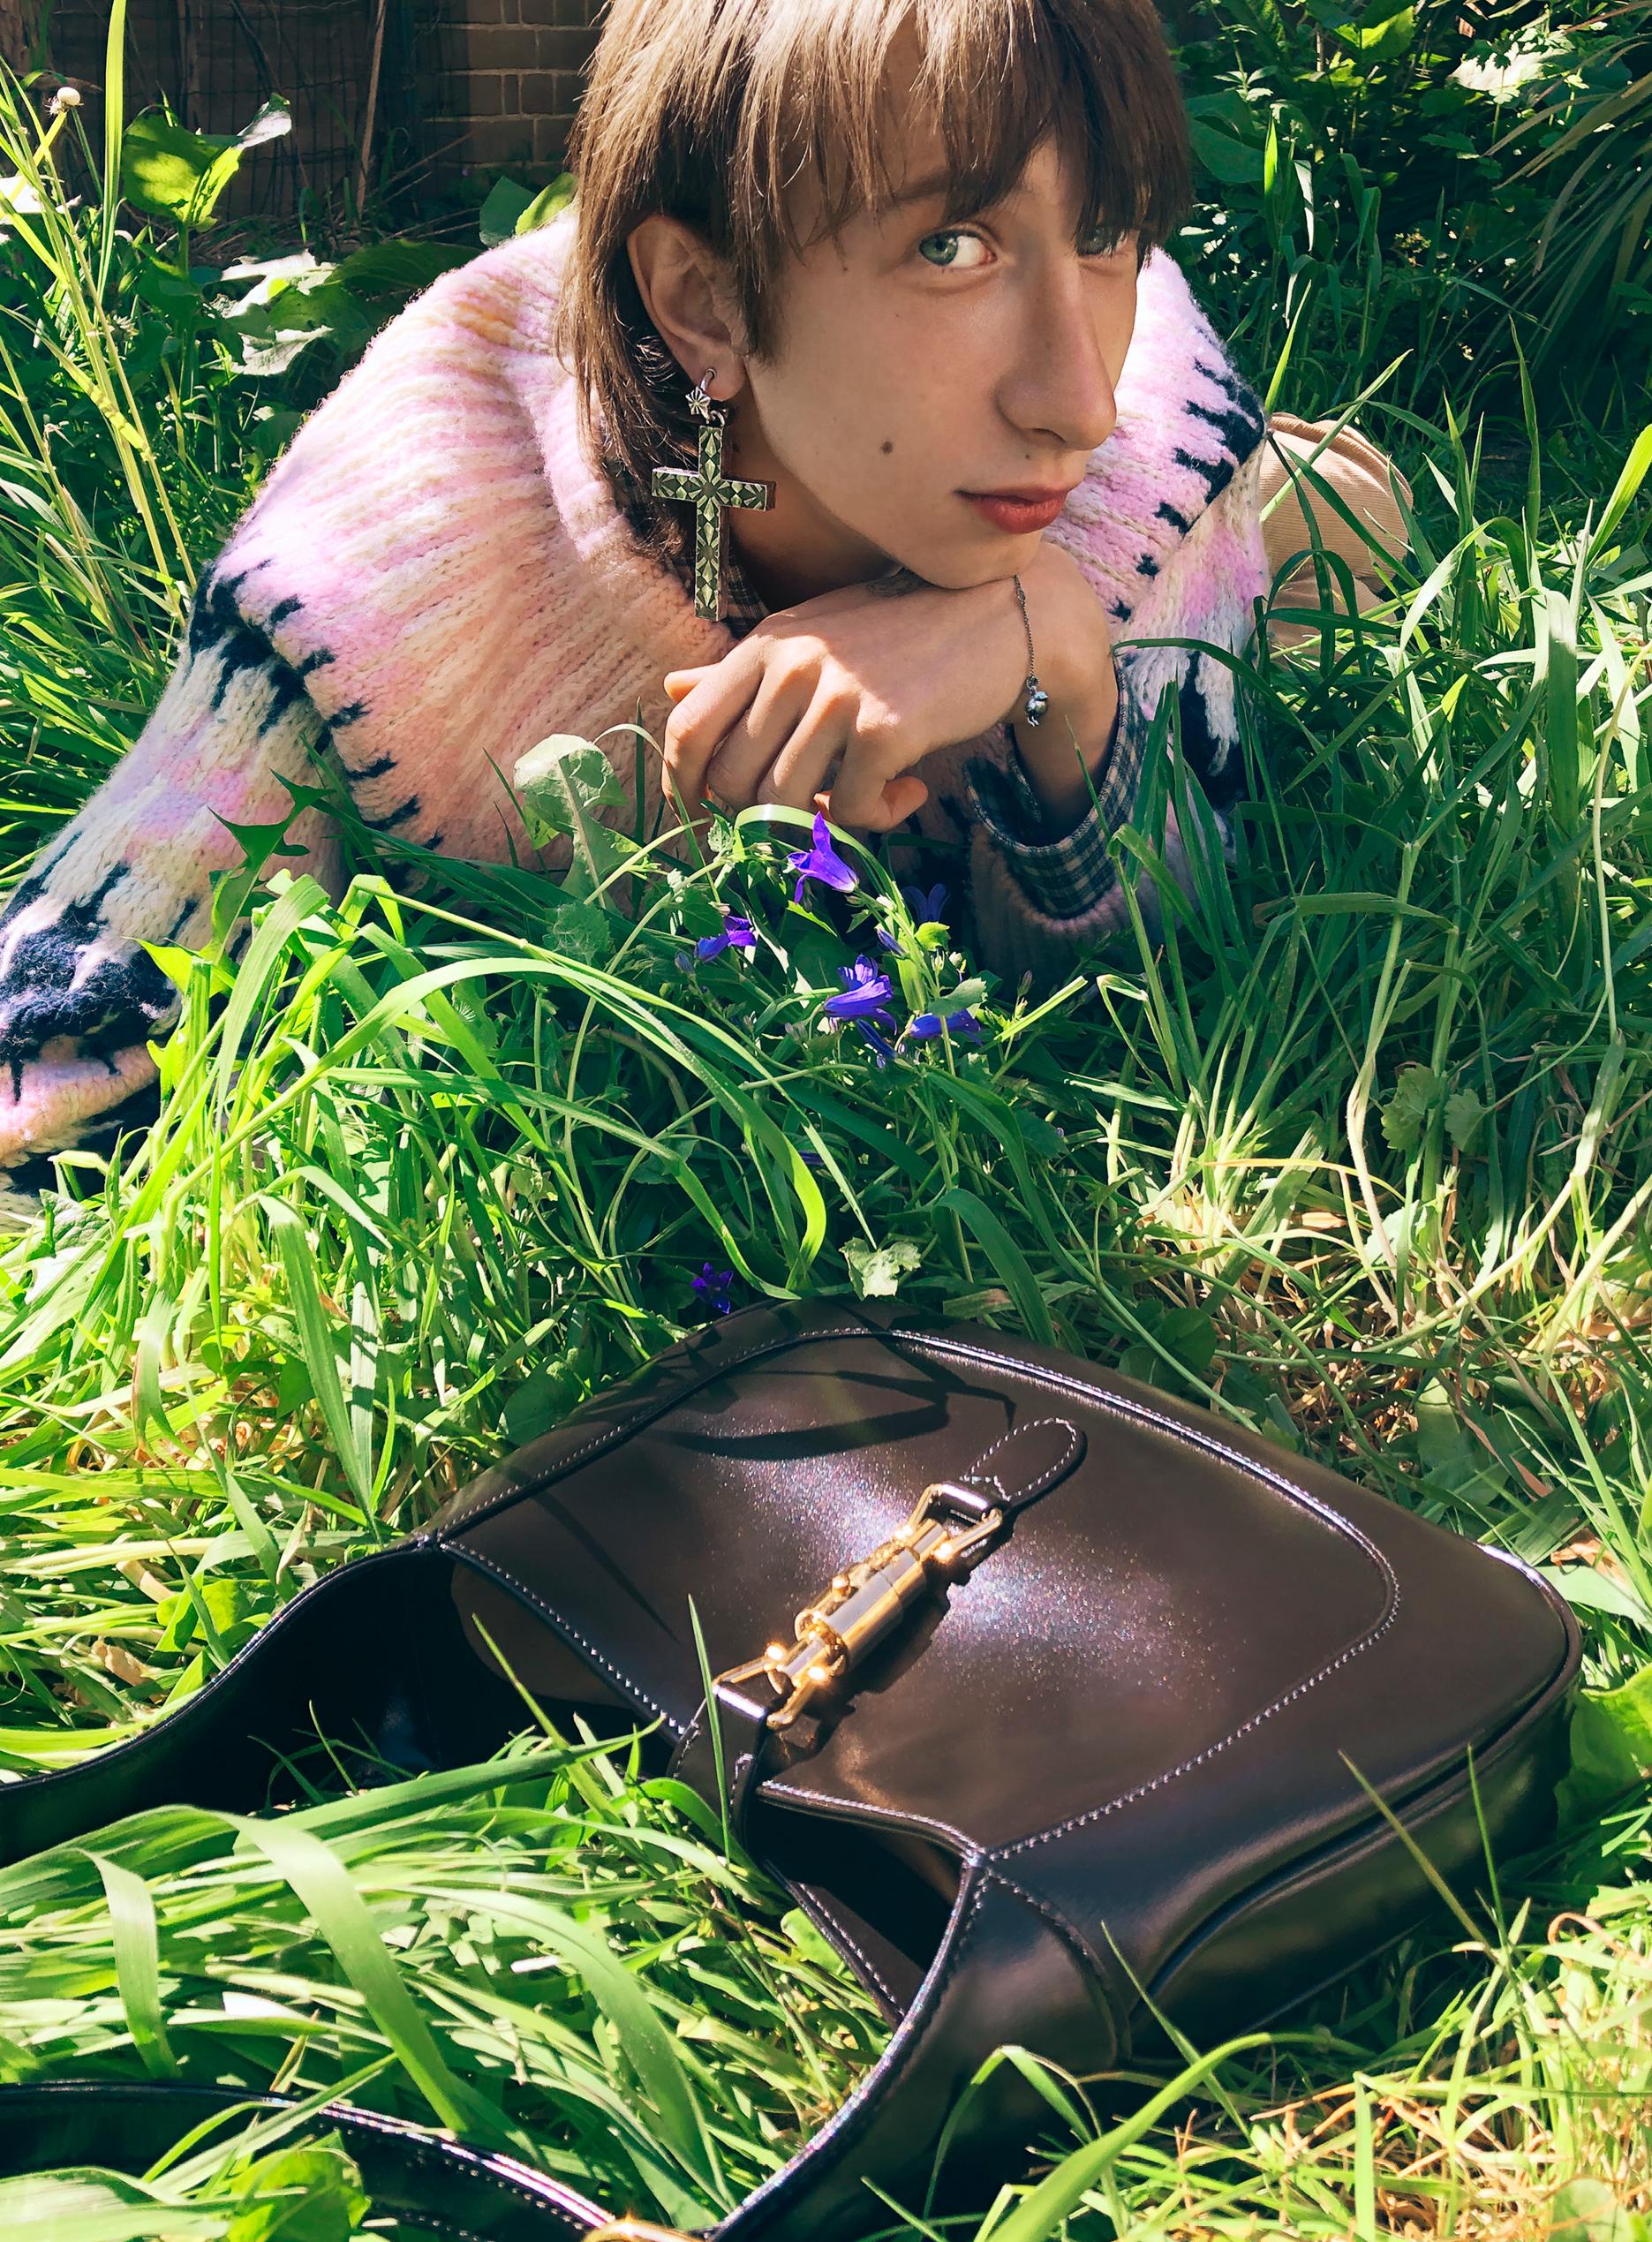 Gucci 'The Ritual' Fall 2020 Ad Campaign Film & Photos